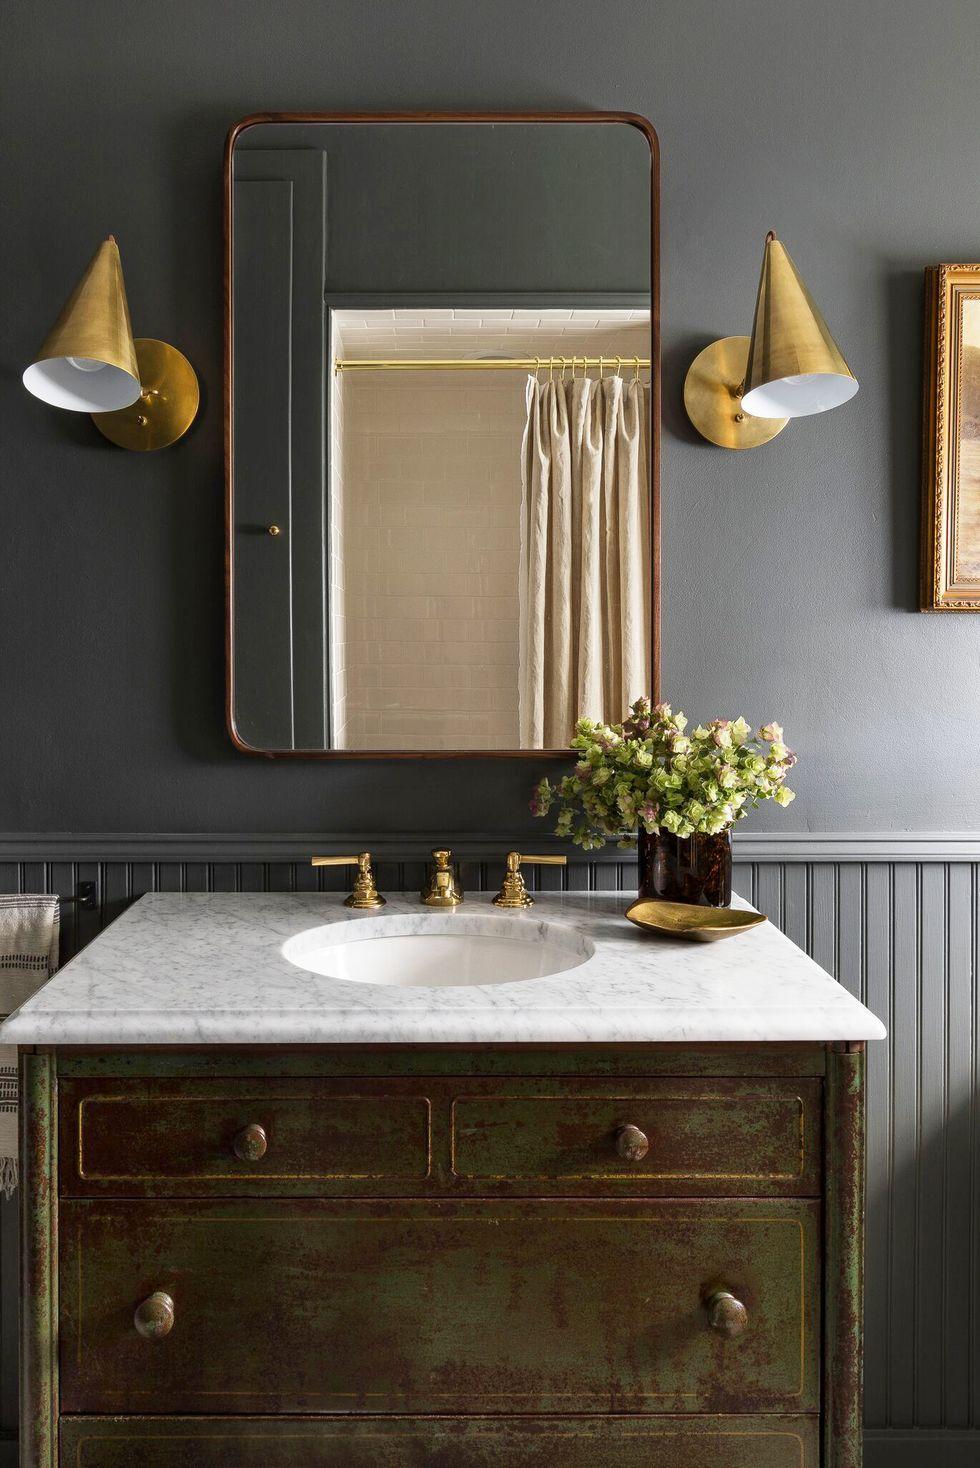 5 Best Bathroom Colors - Top Paint Colors for Bathroom Walls